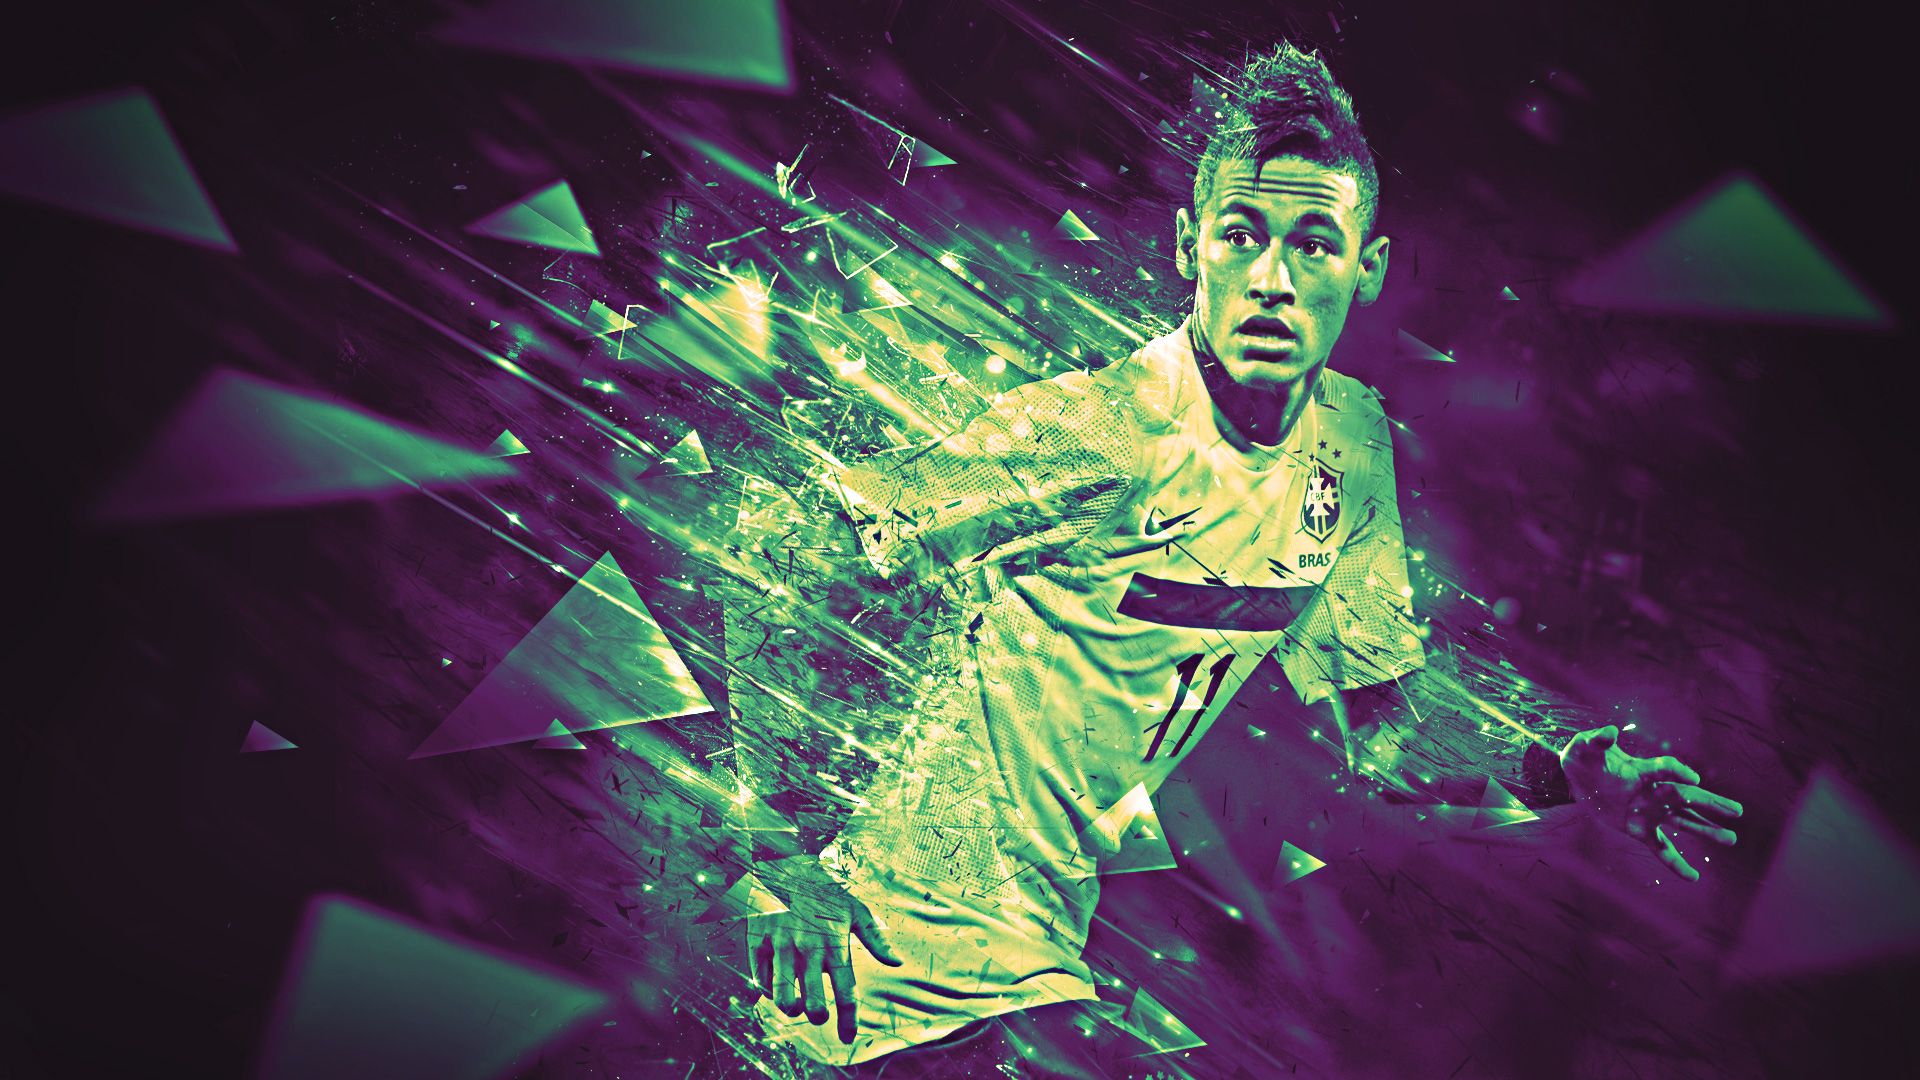 Neymar wallpapers in 2016 Barcelona and Brazil 1920x1080